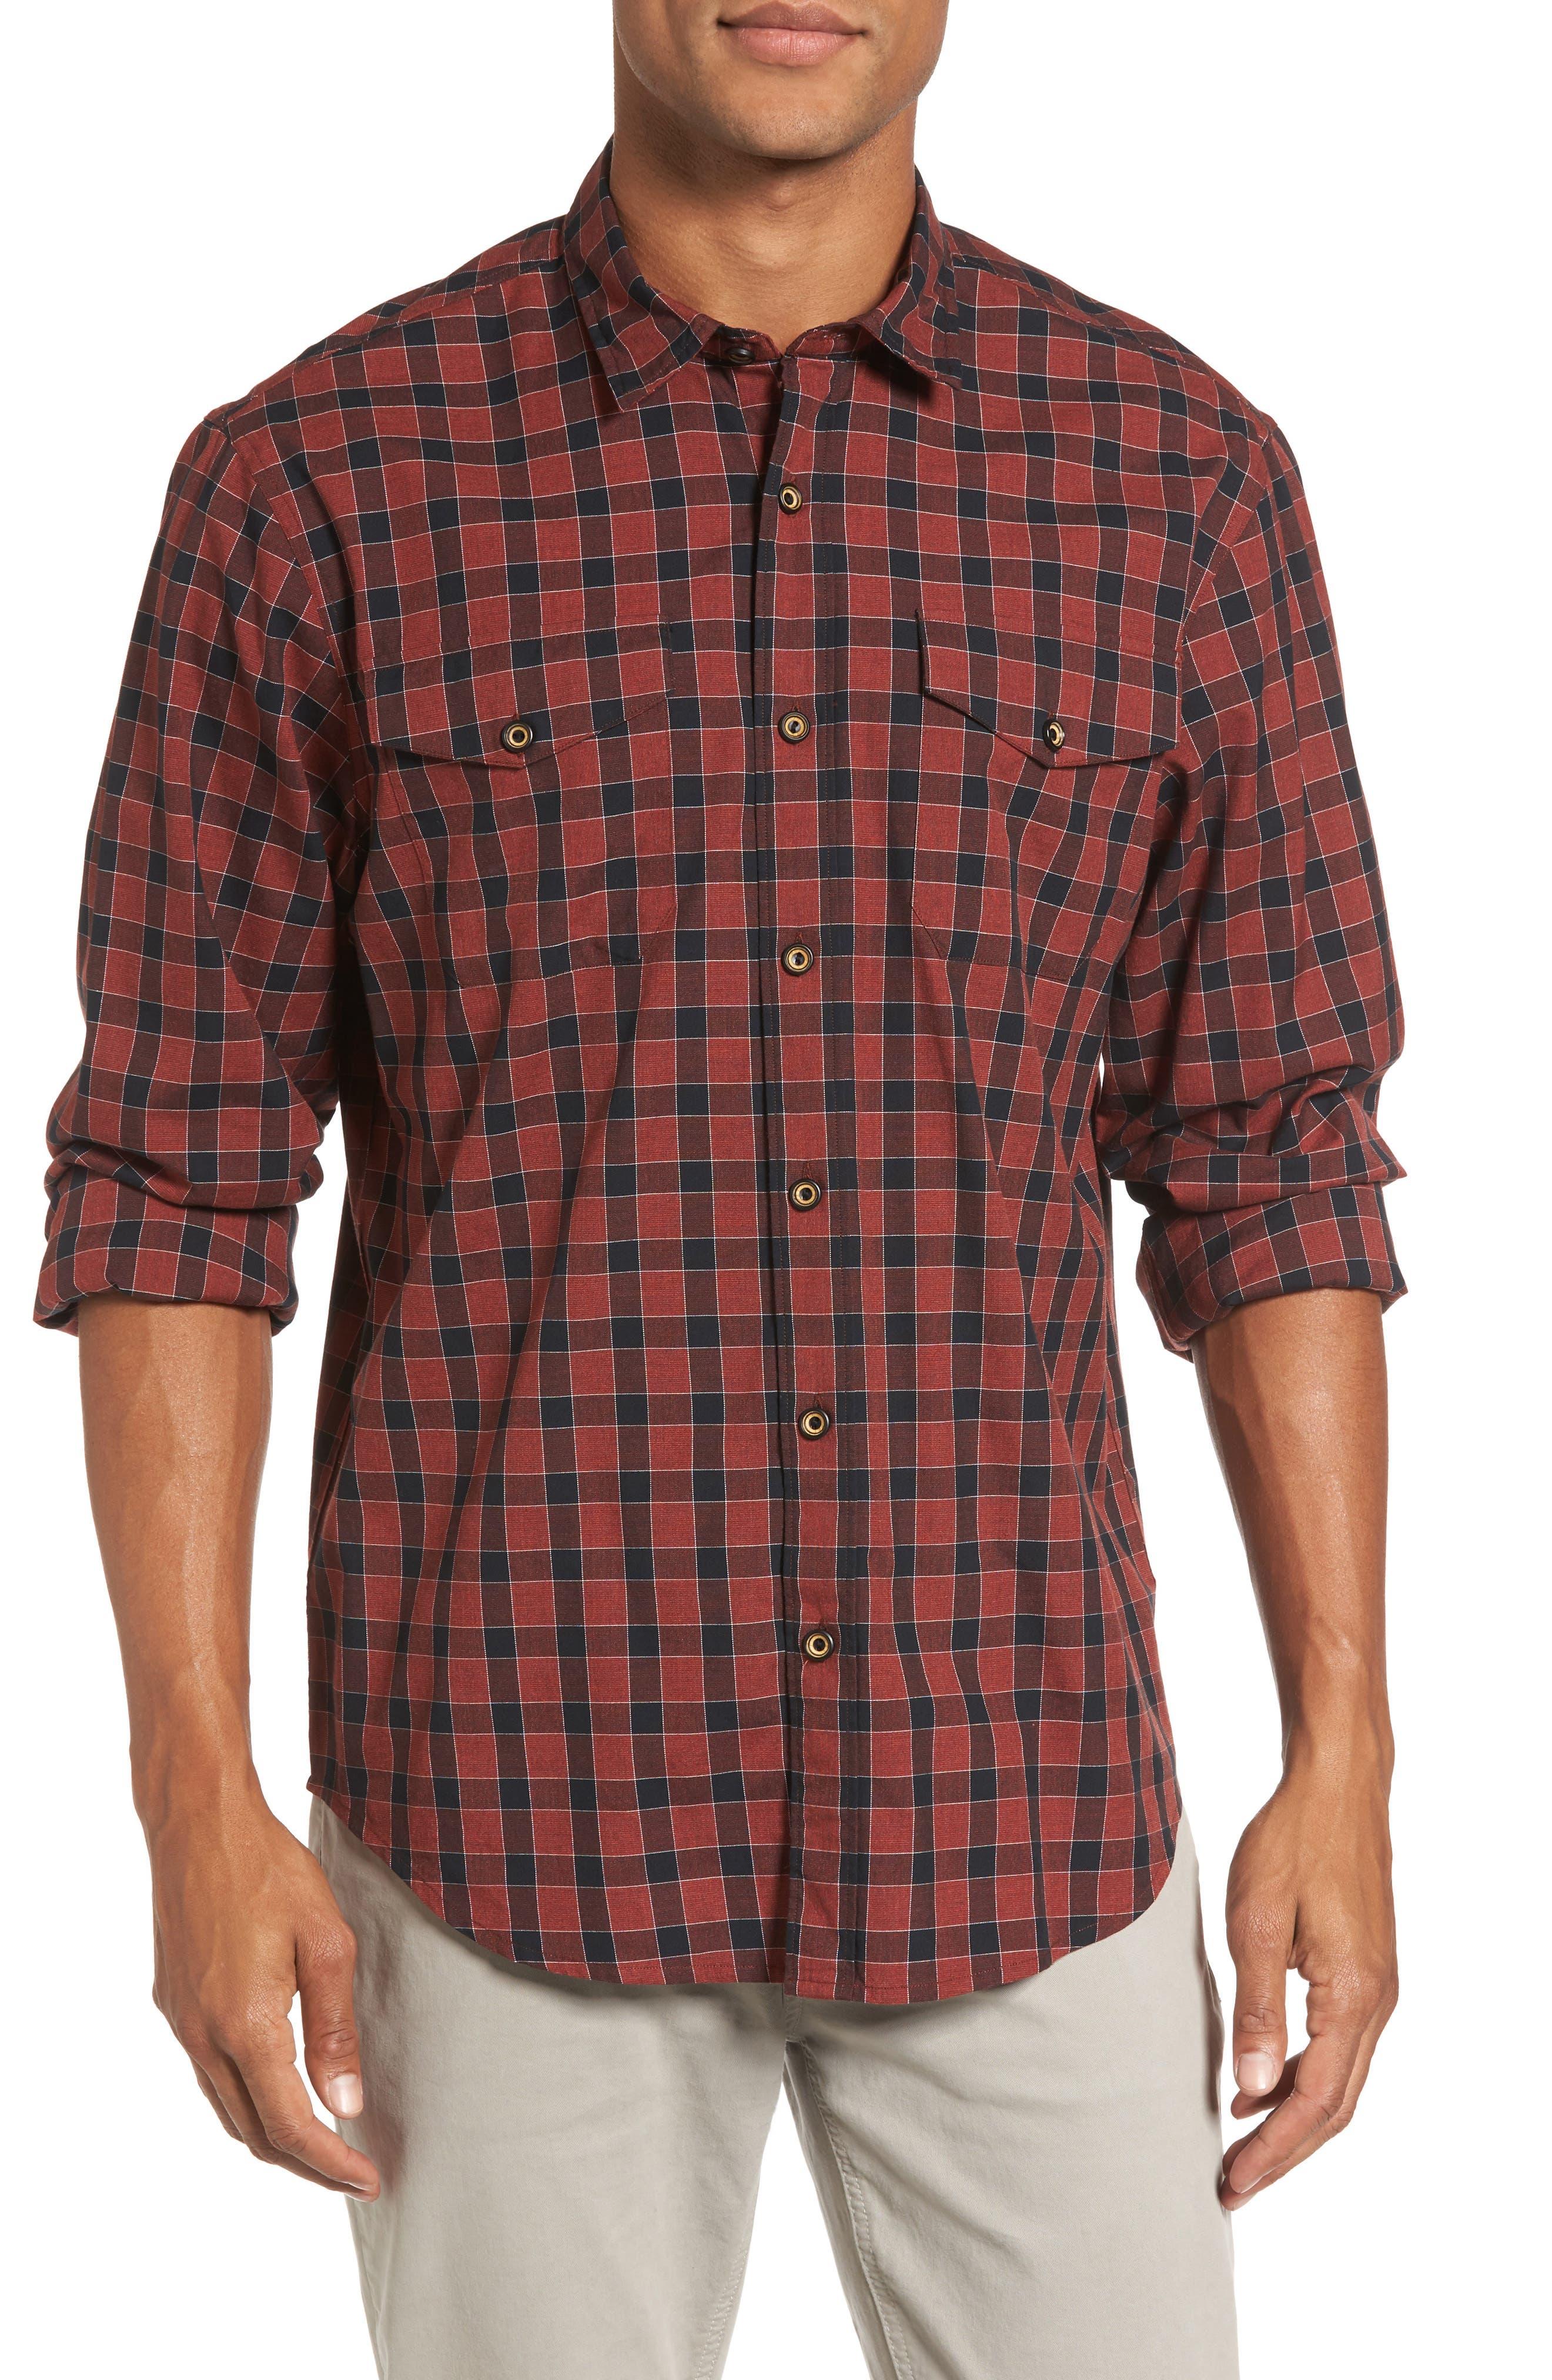 Lake Plaid Flannel Shirt,                         Main,                         color, Red